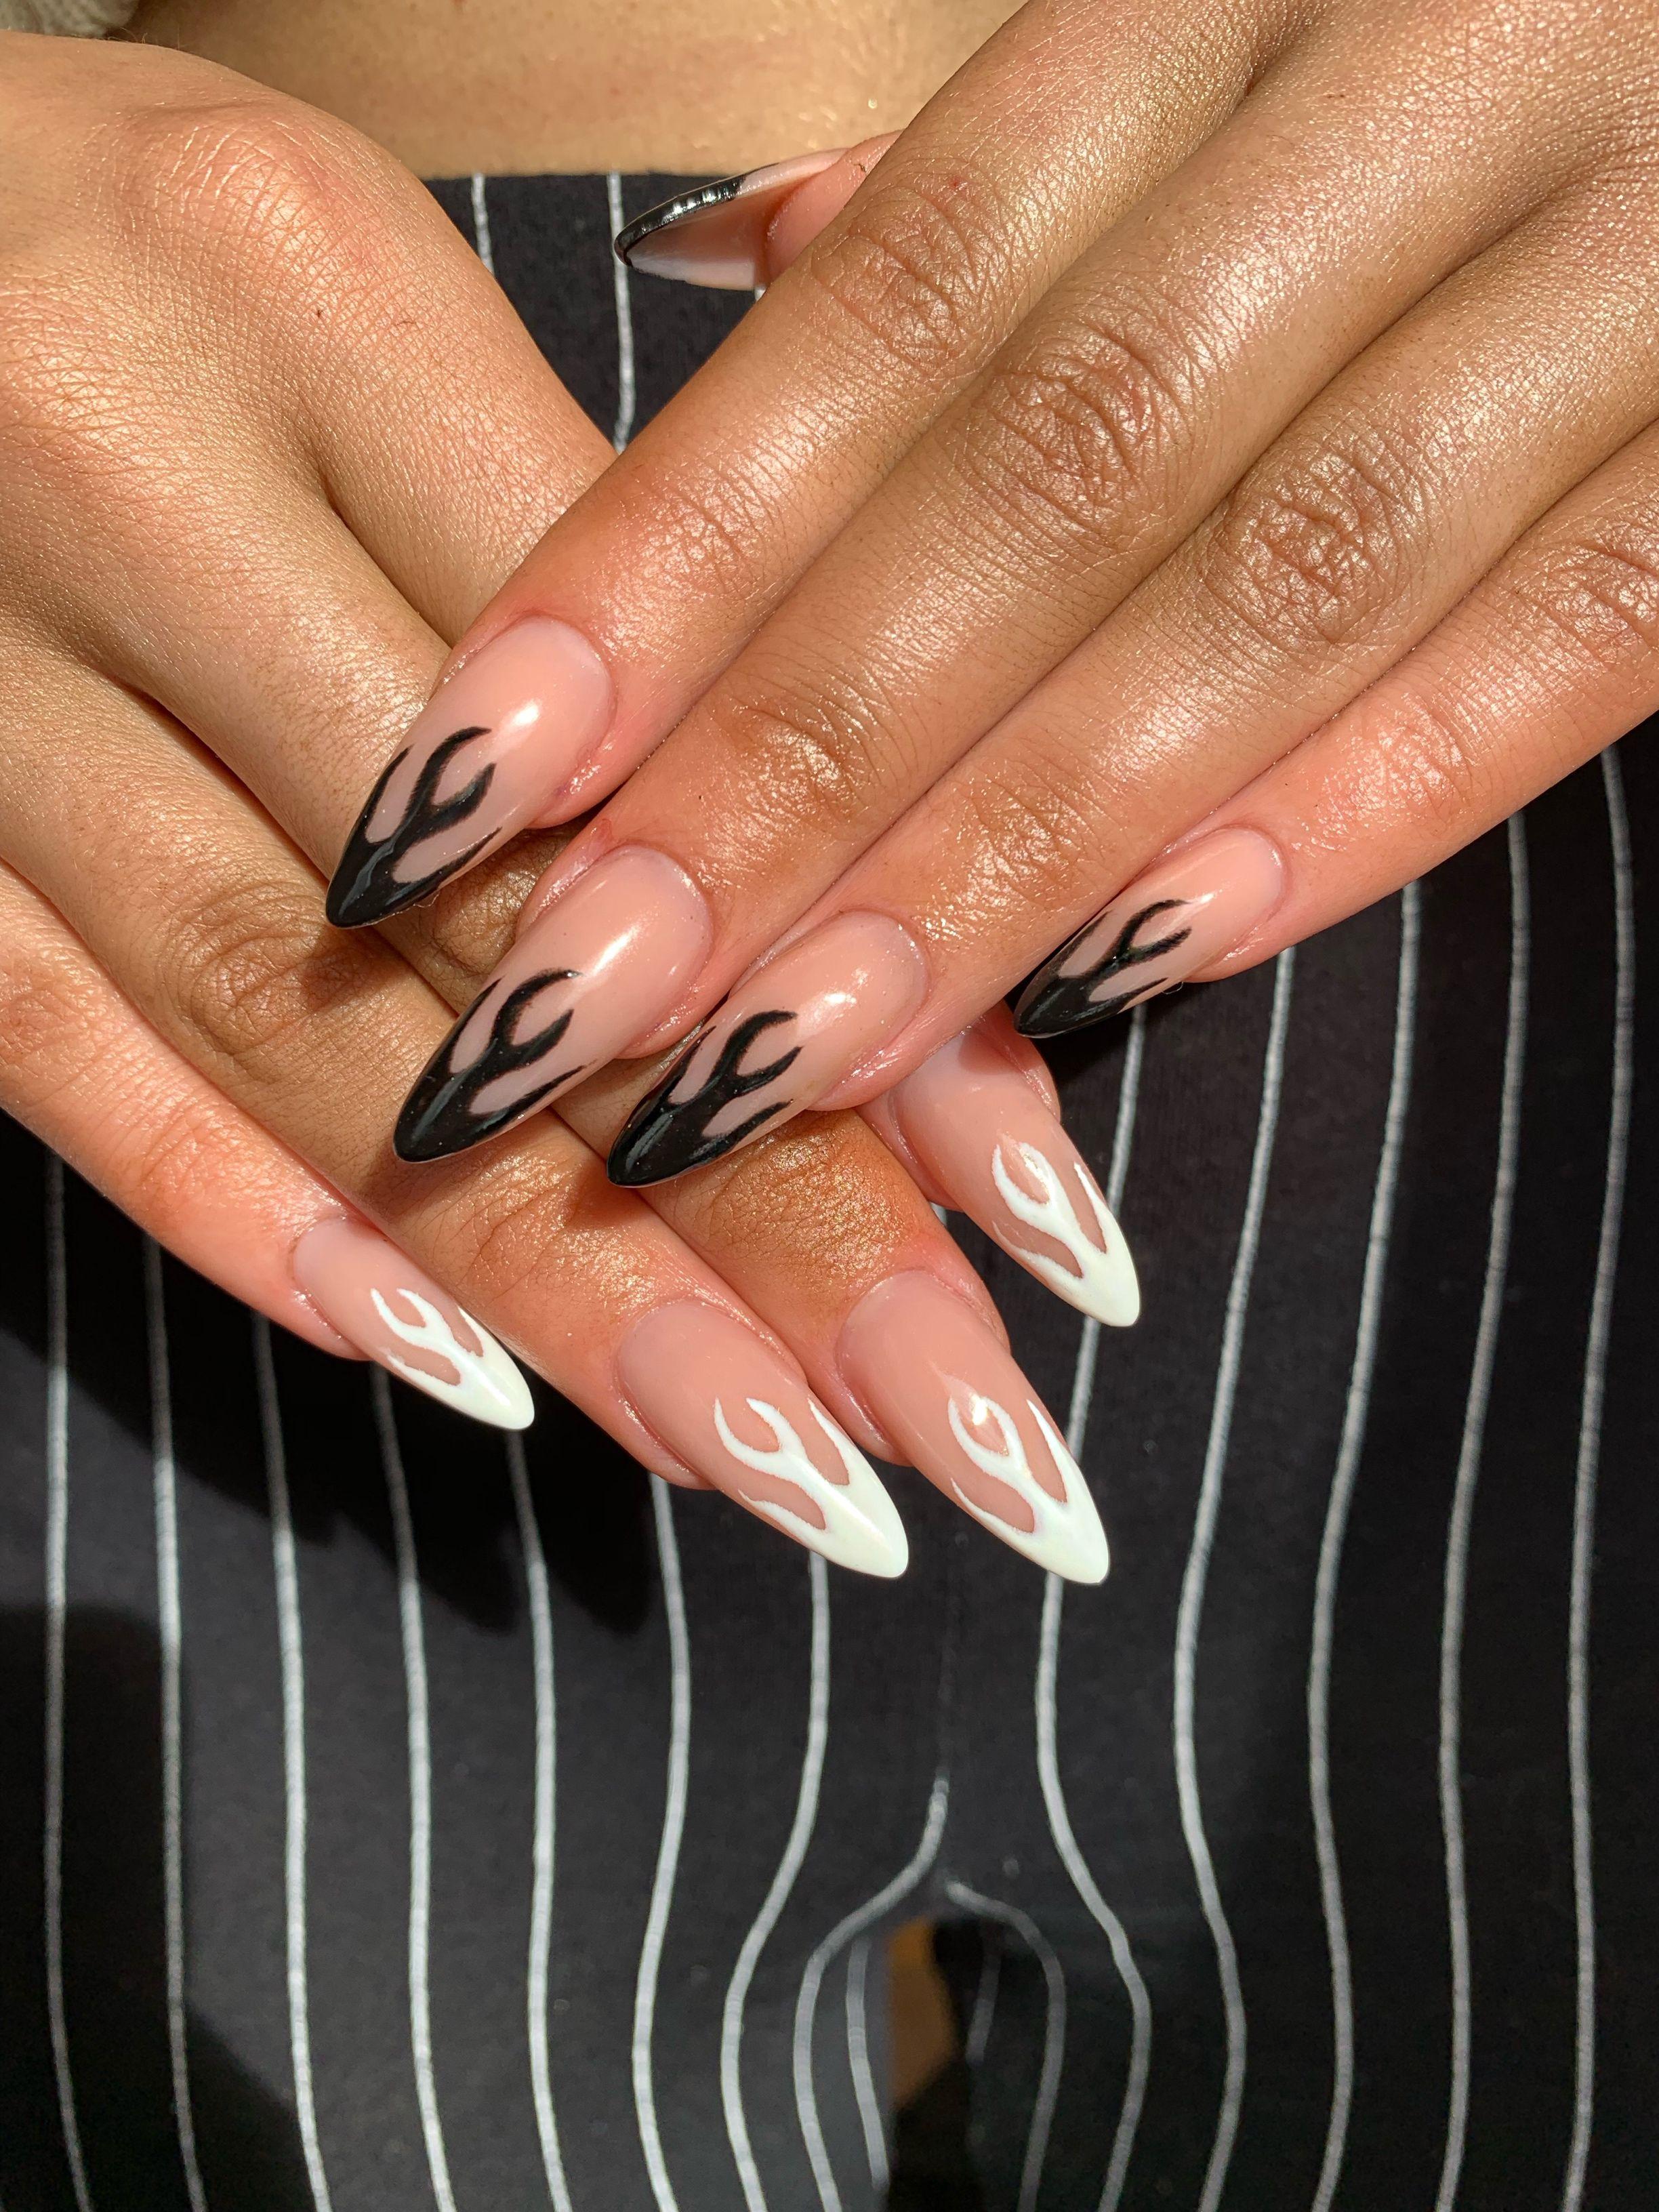 Flame Nails Almond Acrylic Nails Fake Nails Fire Nails